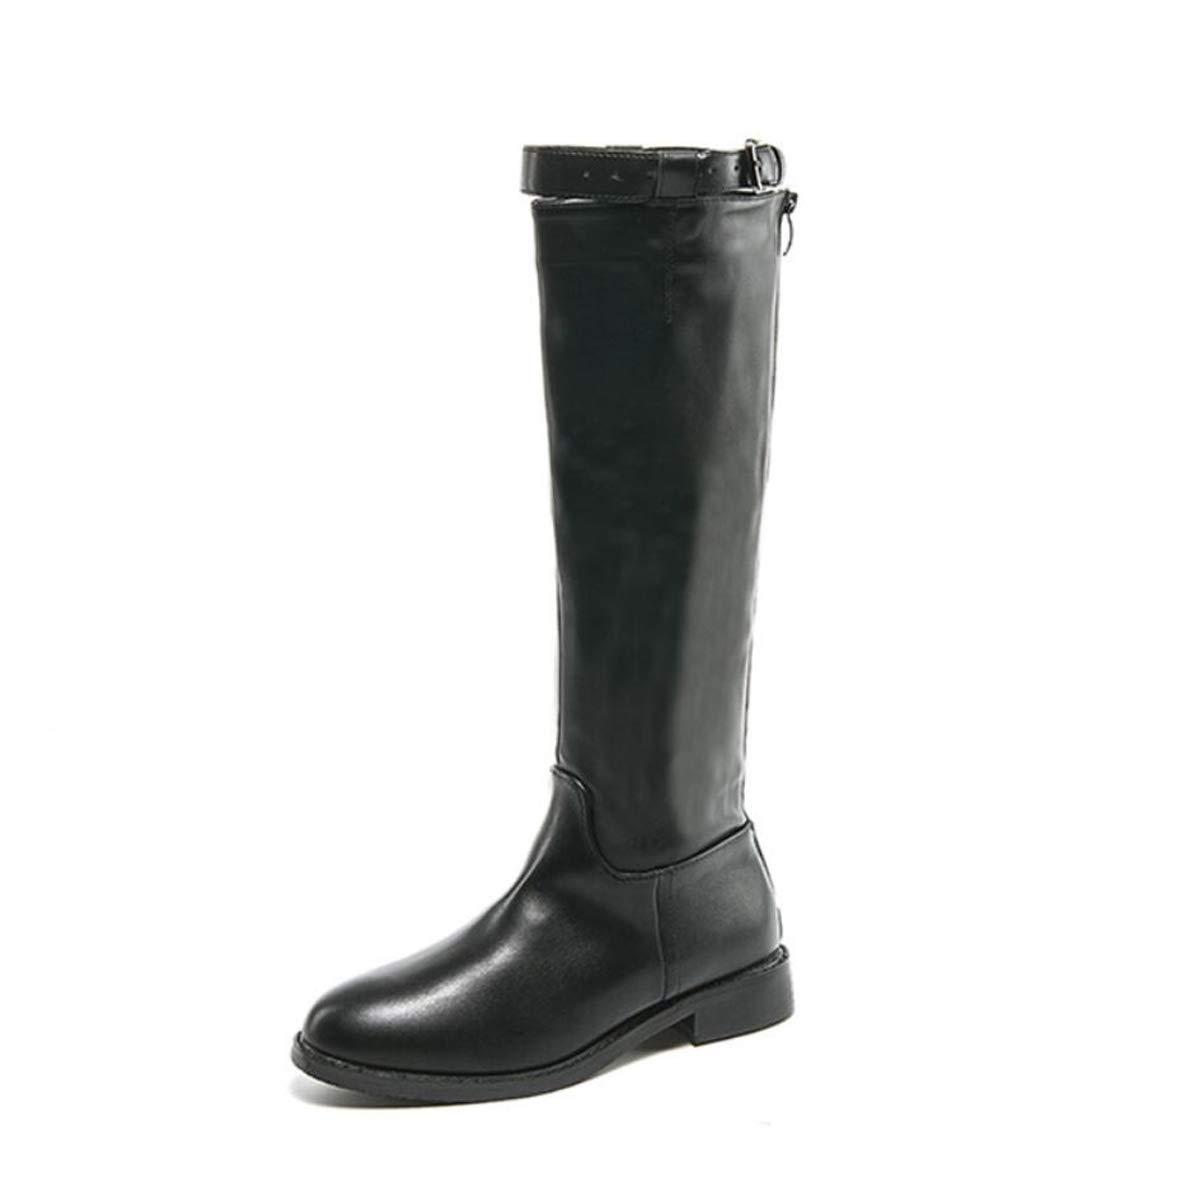 Fall Womens Low Flat Heel Riding Biker Boots Ladies Knee High Fashion Knight Boots Black